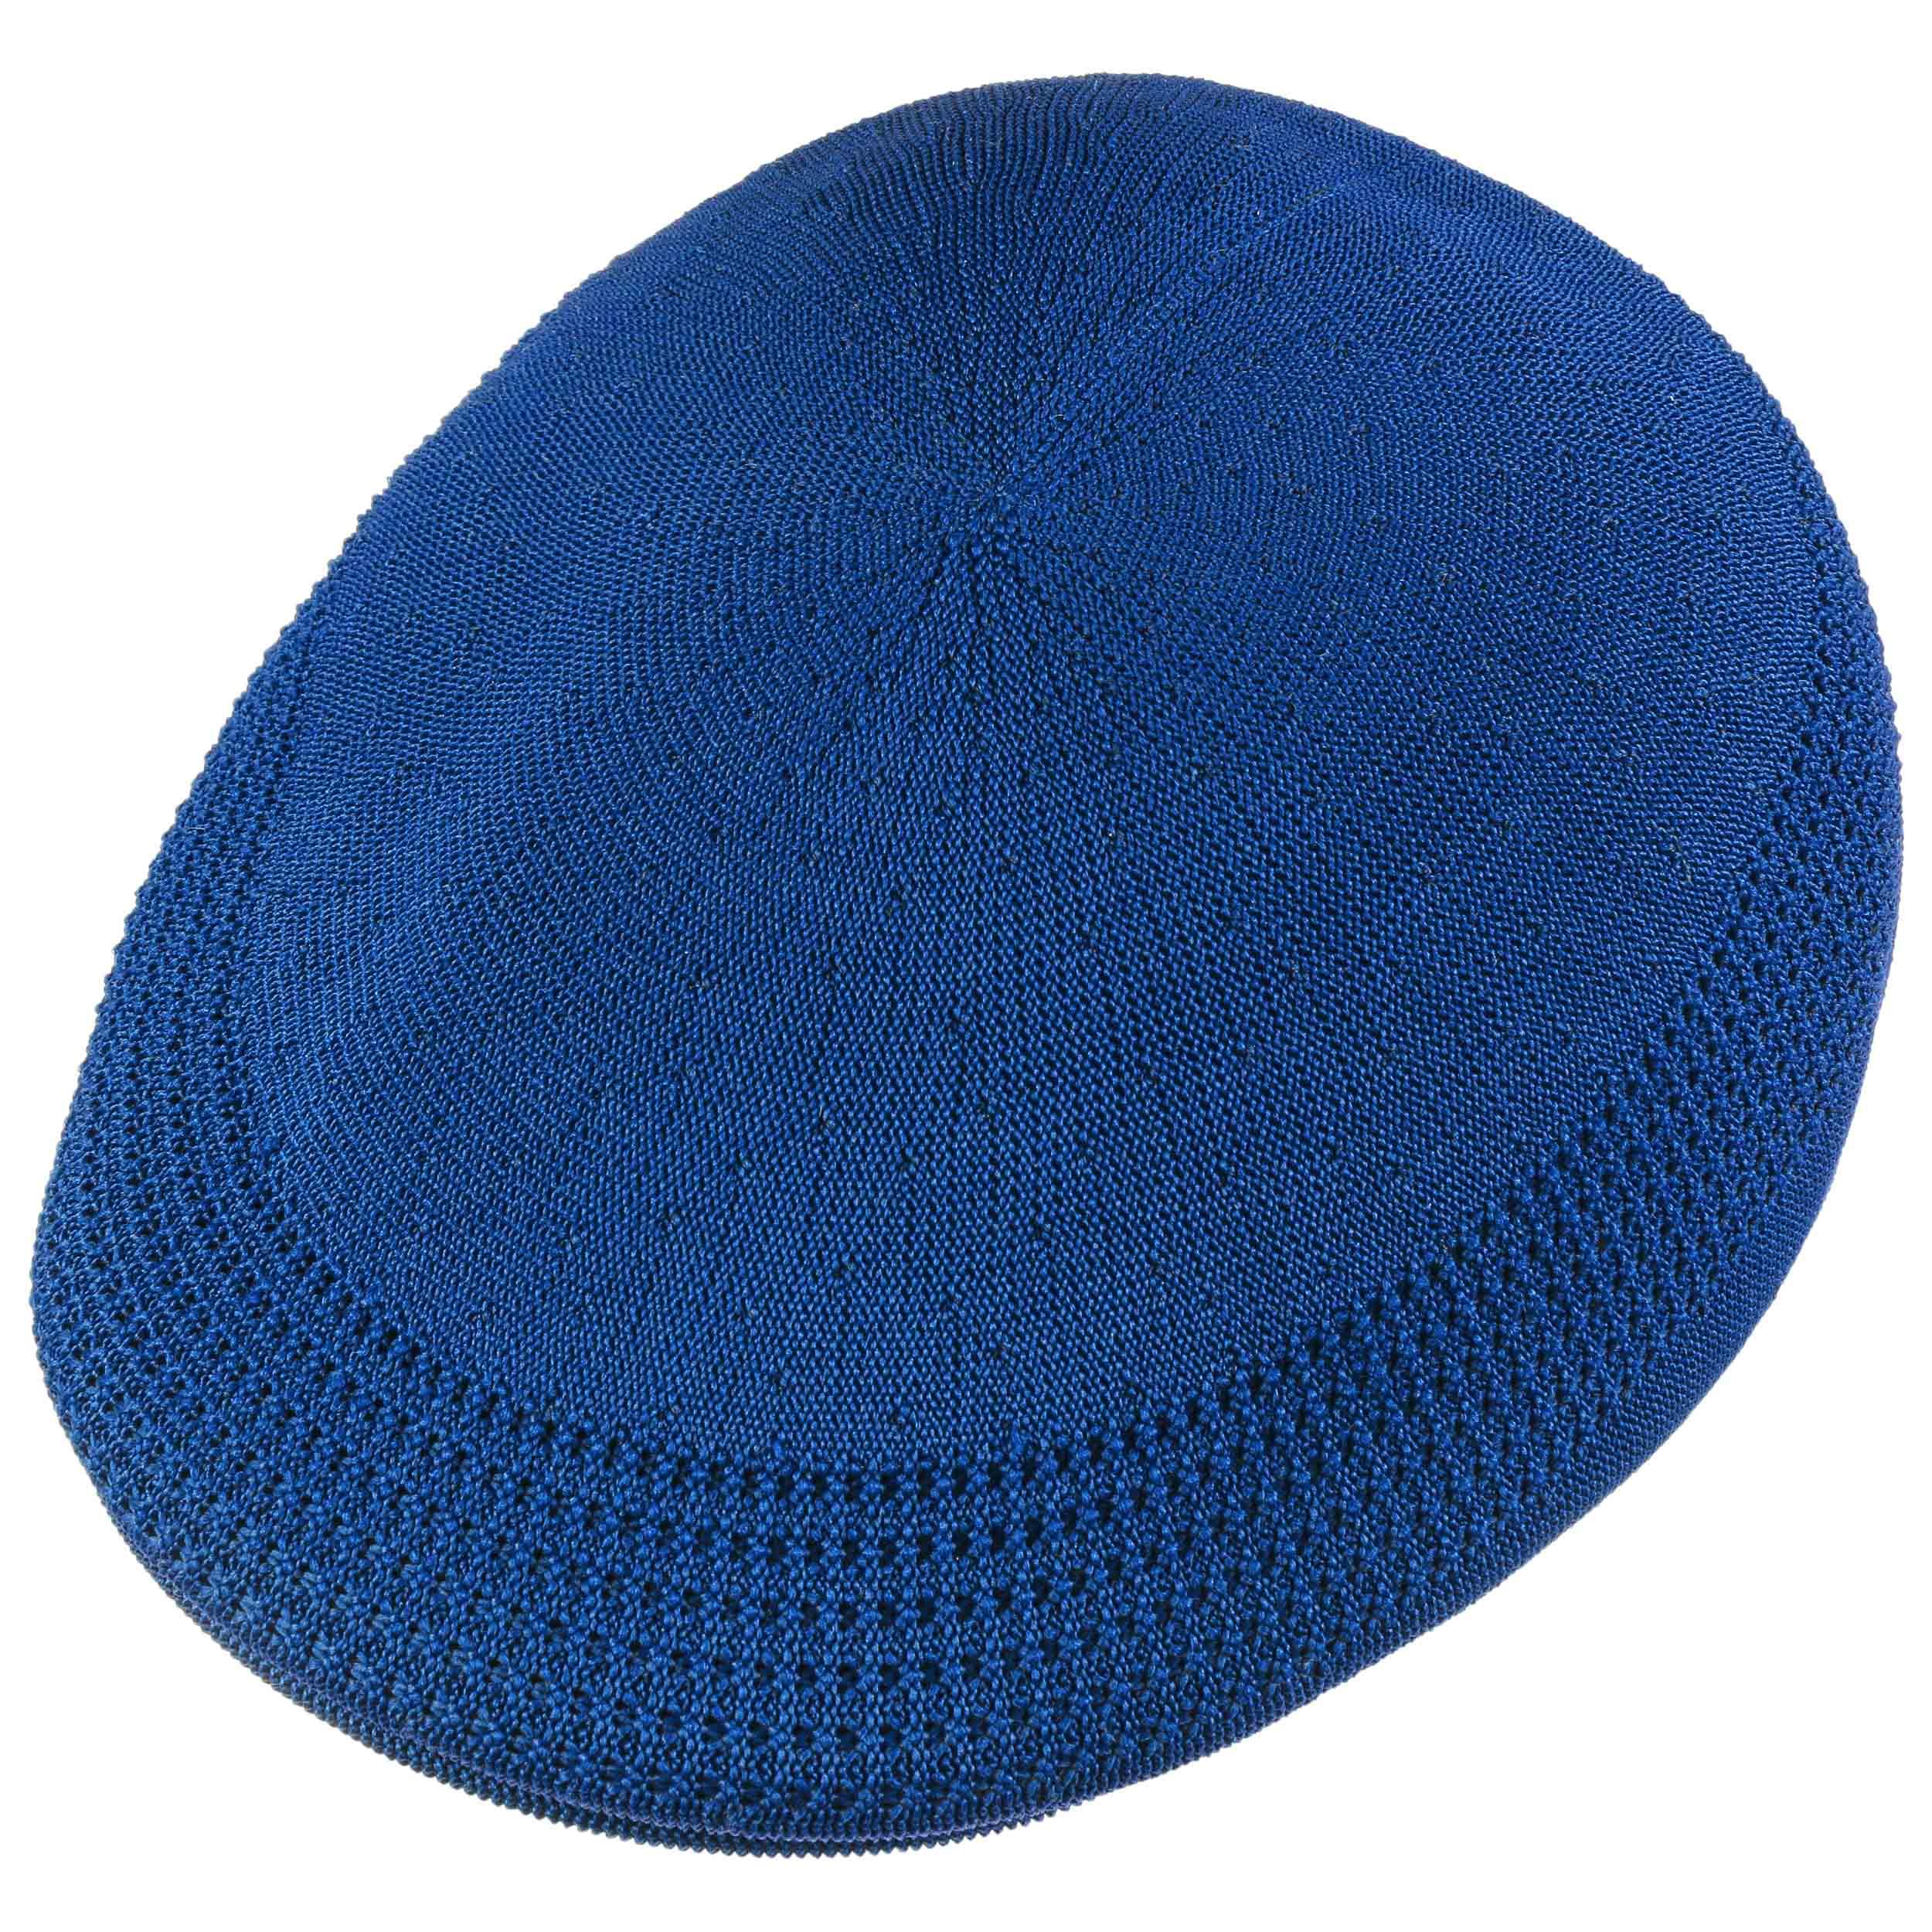 a3795b6fd1a78 ... Tropic 507 Ventair Flat Cap by Kangol - royal-blue 1 ...